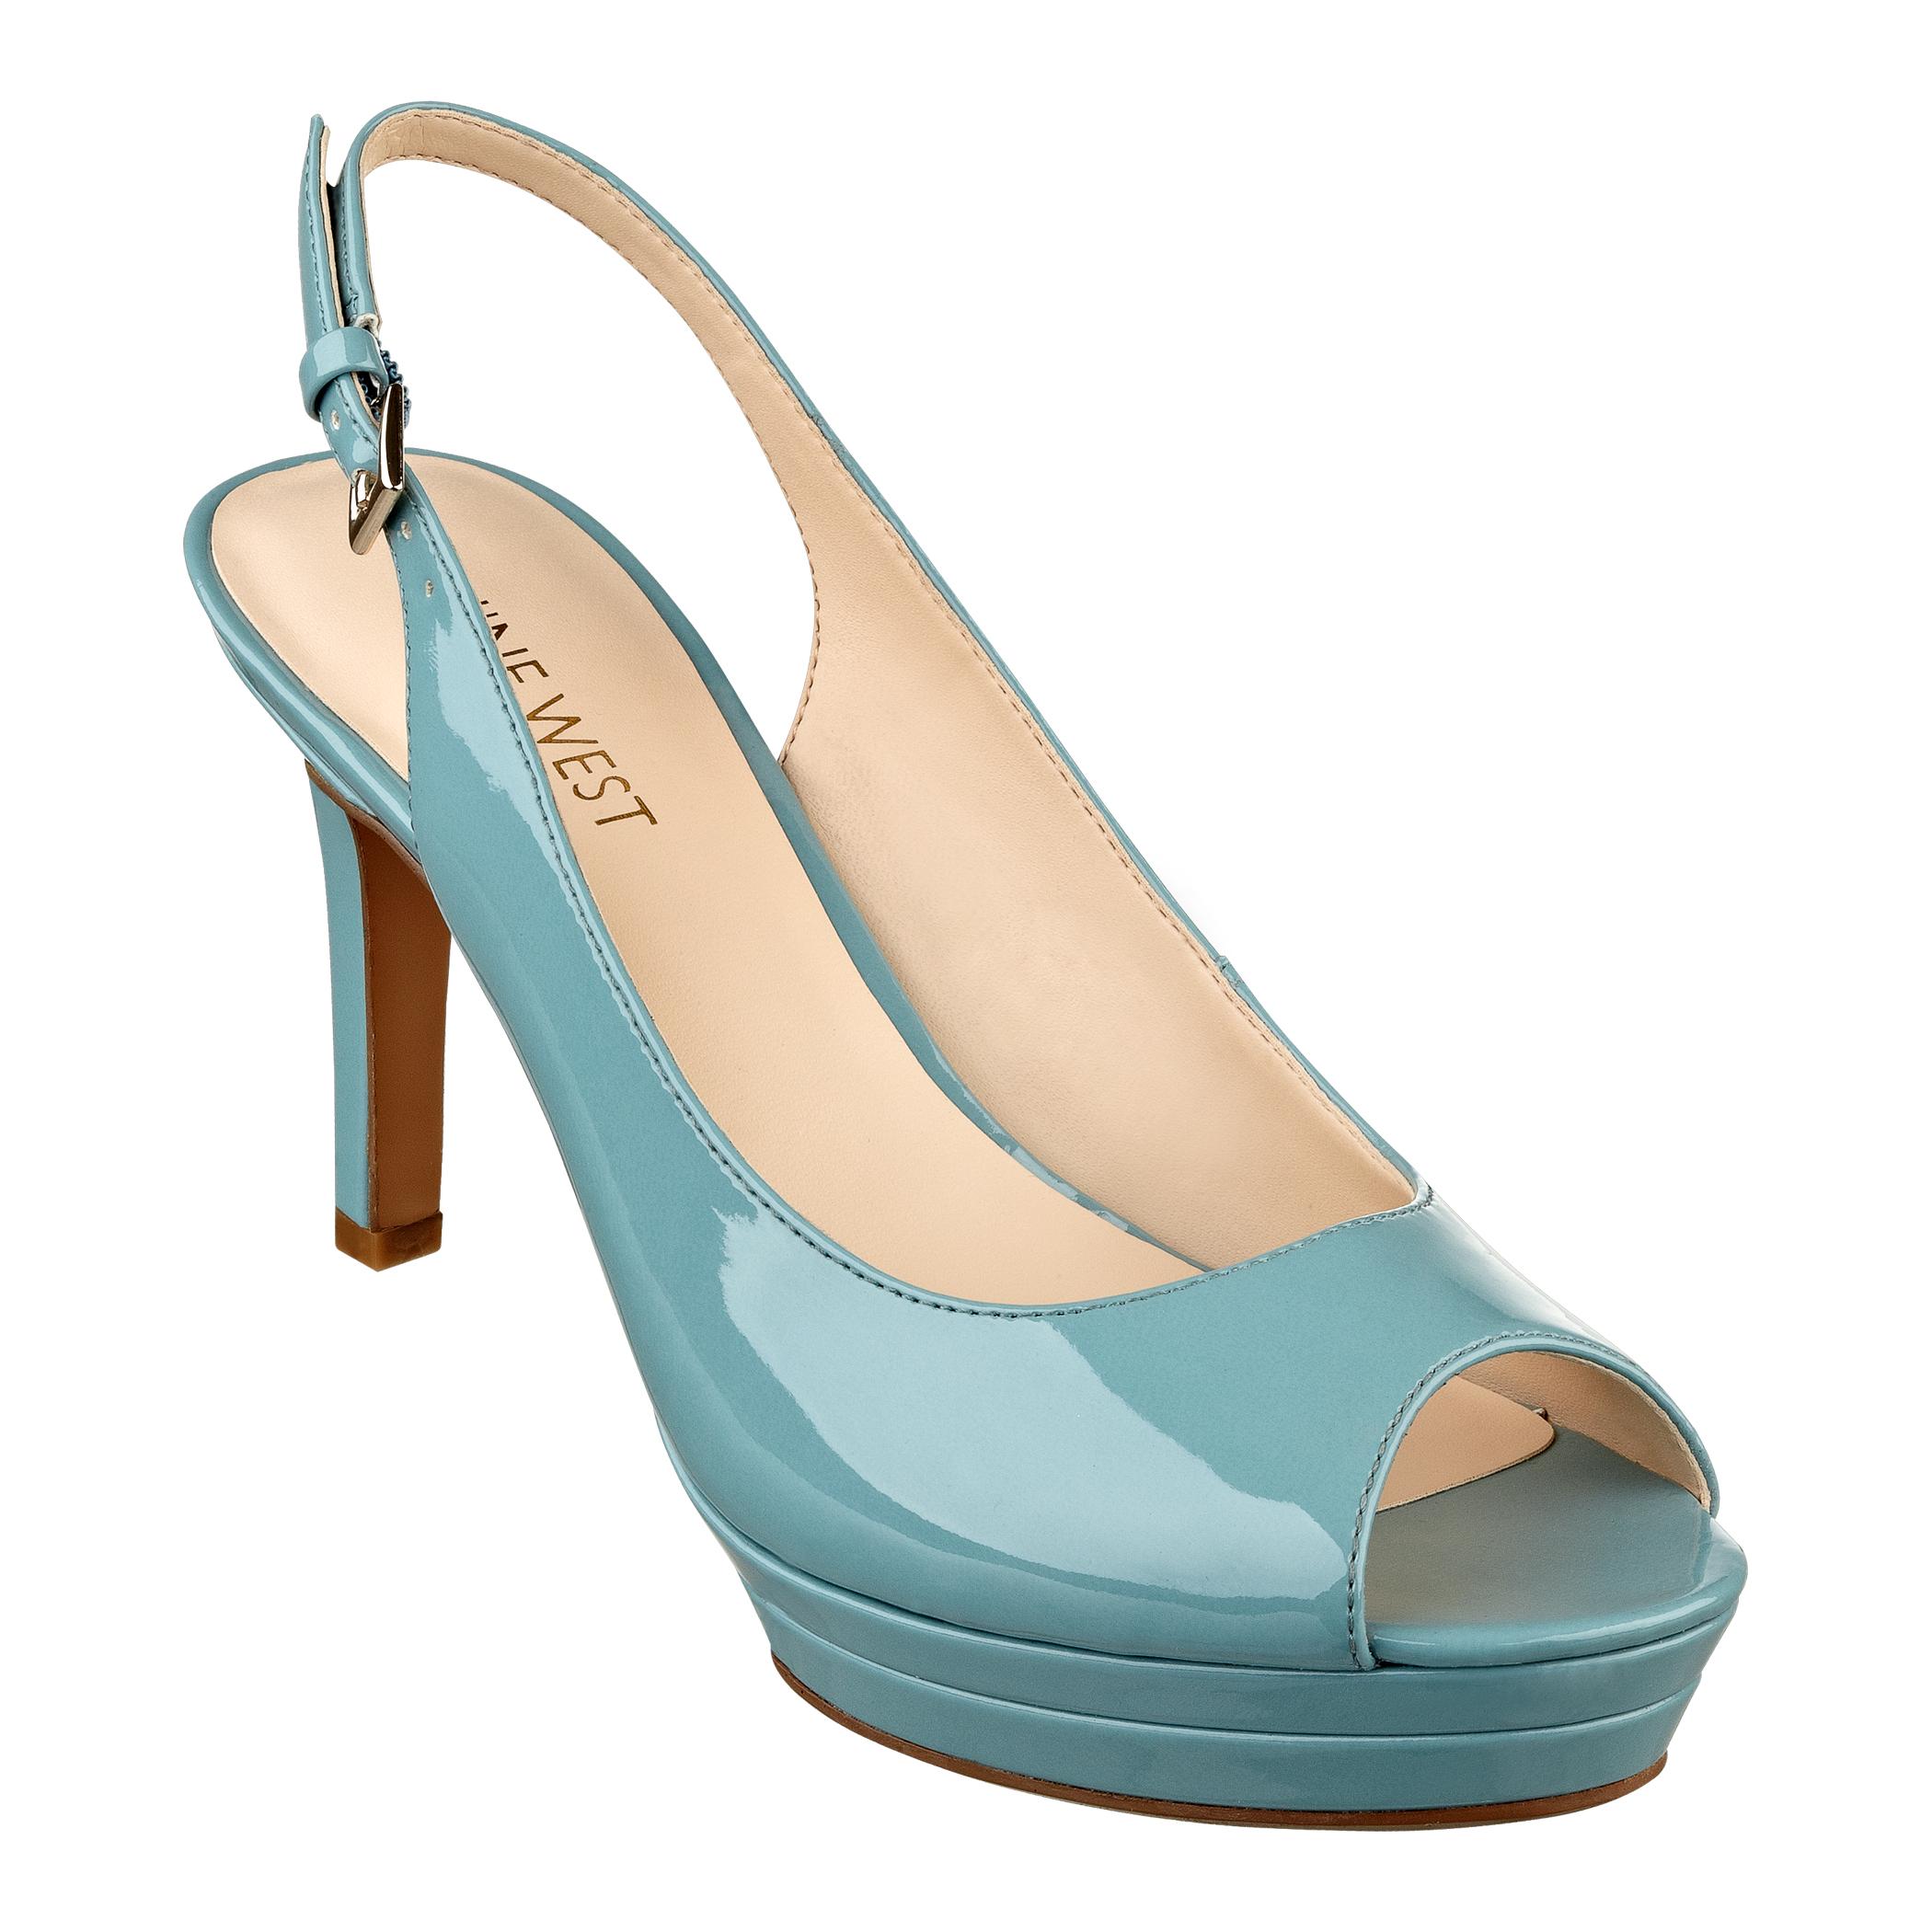 c5eb732ccf6 Lyst - Nine West Able Platform Heels in Blue